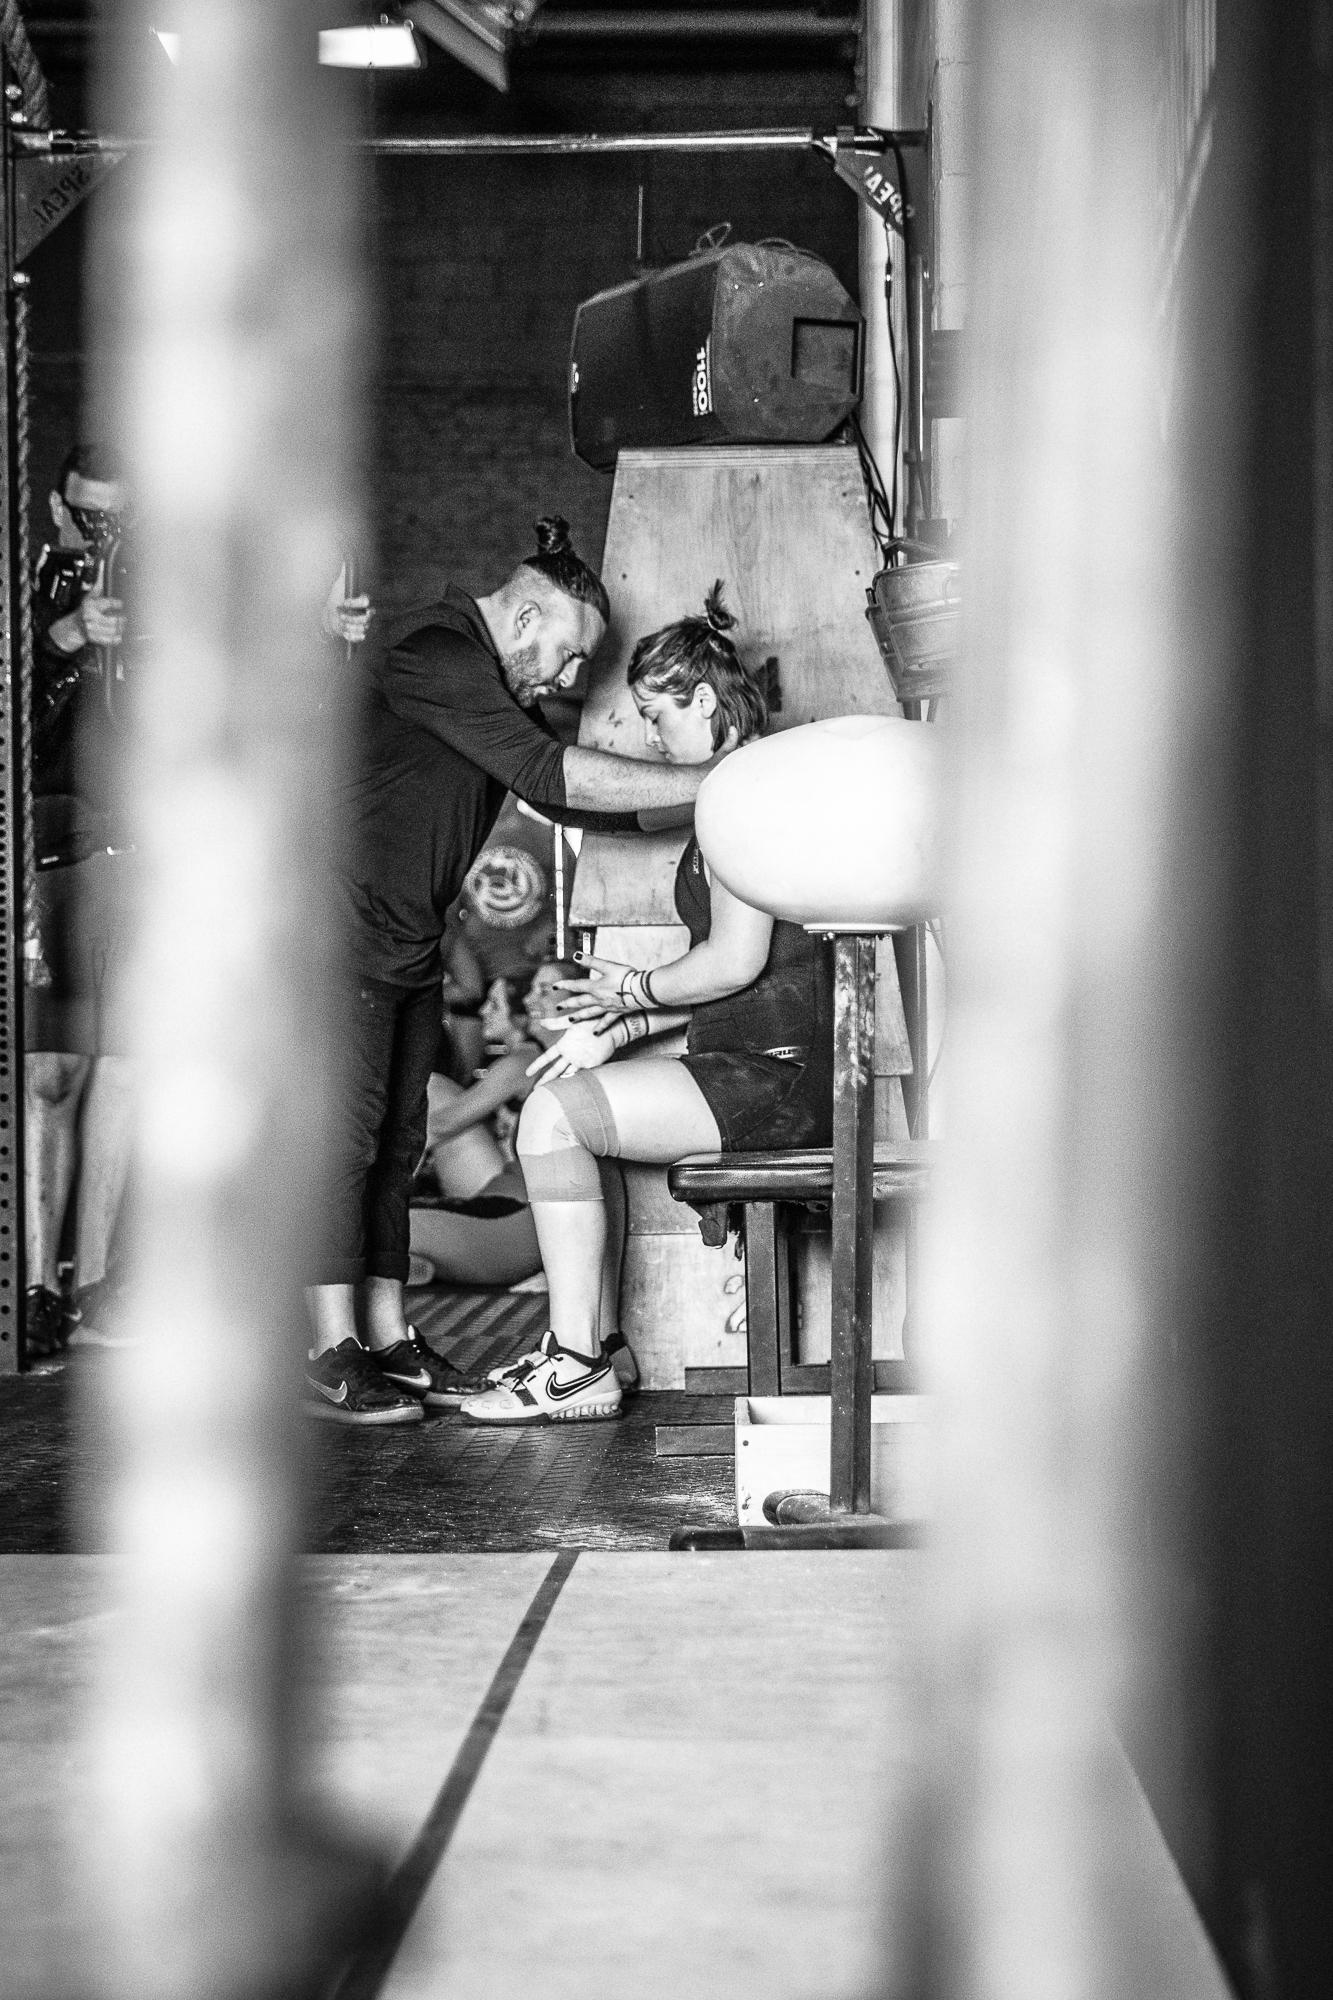 brooklyn-barbell-club-everyday-lifters-17.jpg